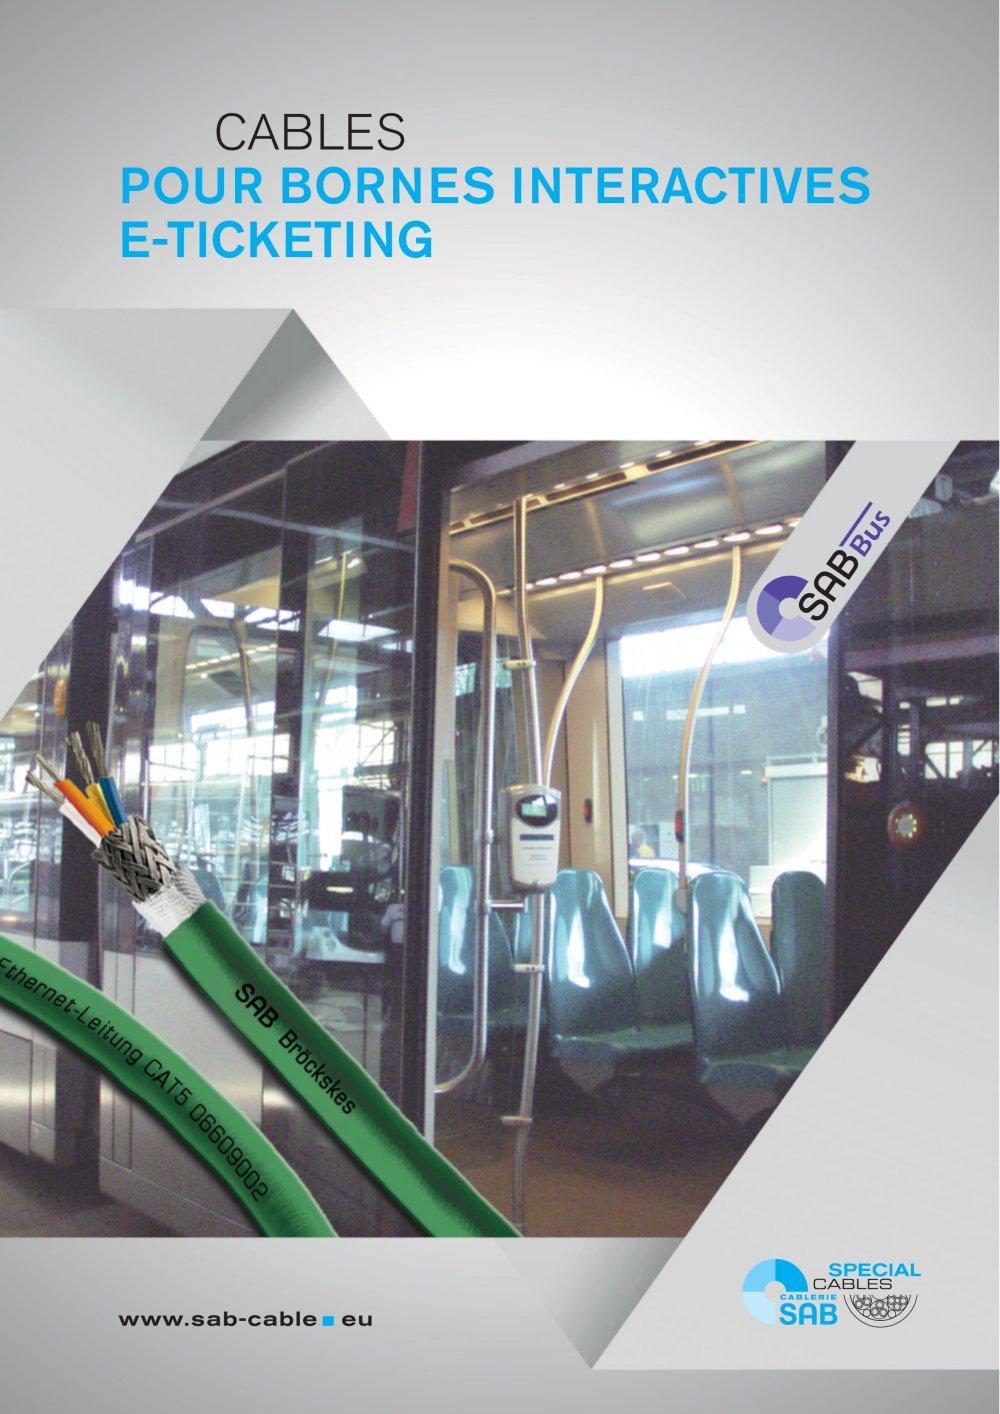 Cables pour bornes interactives E-Ticketing - SAB BROECKSKES